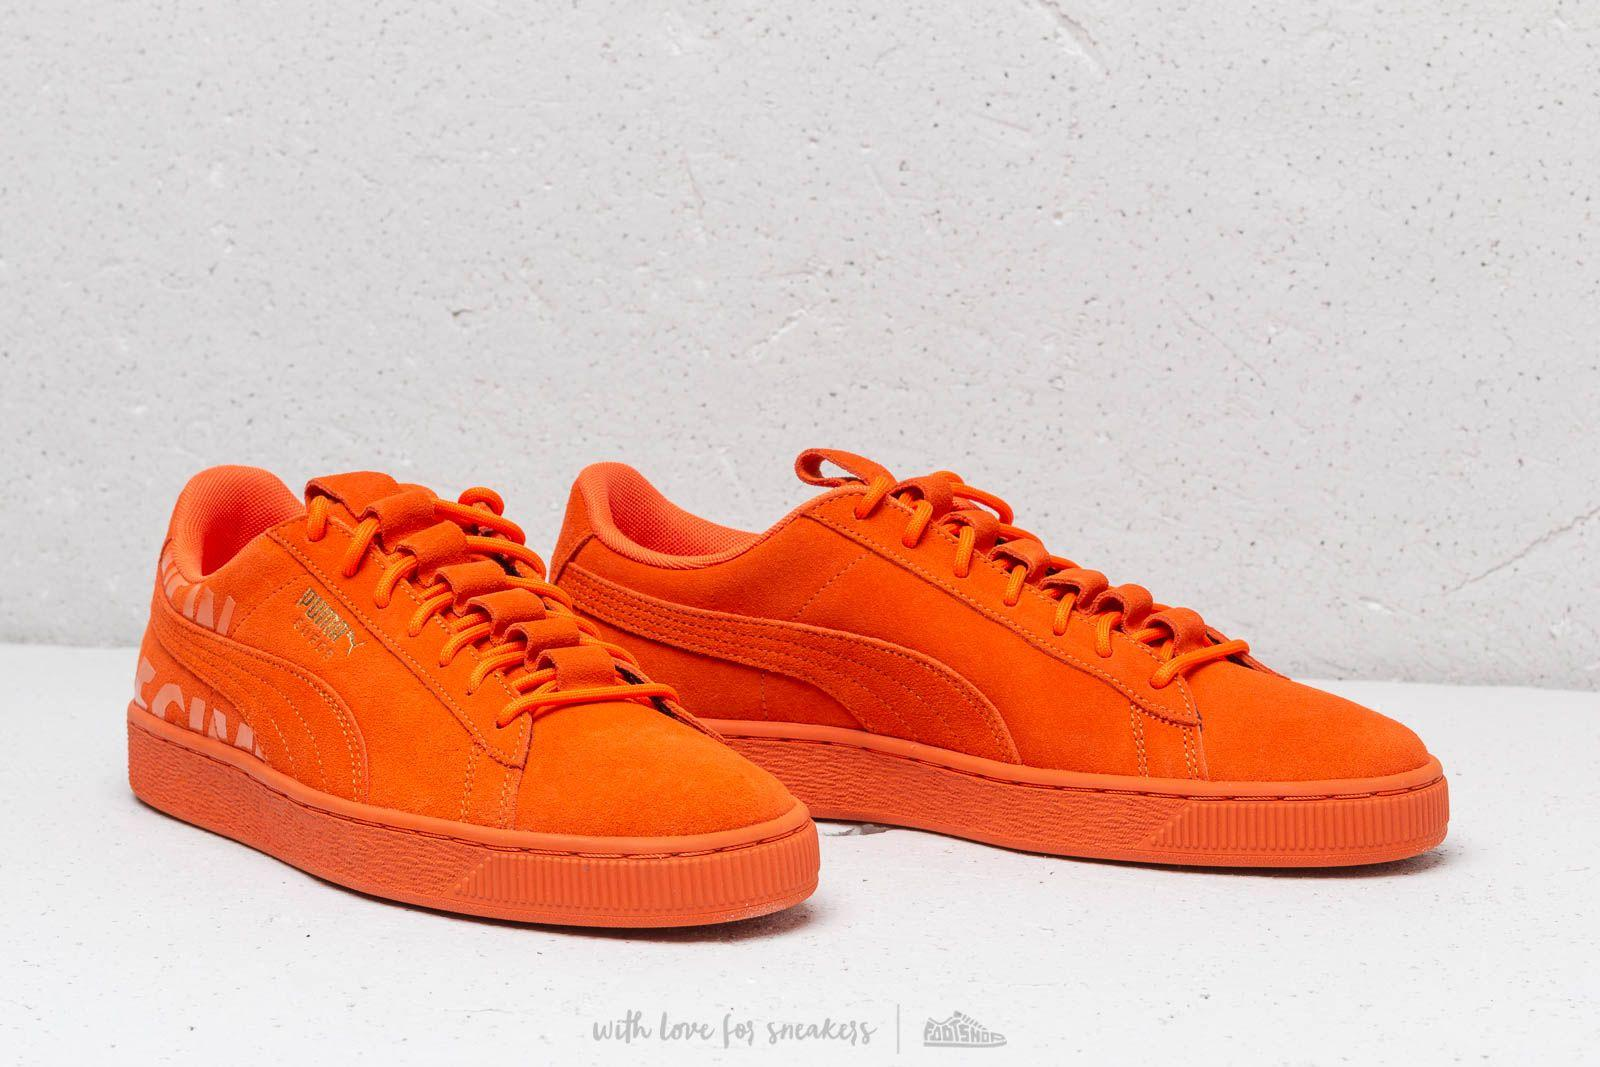 0d6f83601c5 PUMA - Orange X Atelier New Regime Suede Scarlet Ibis  Scarlet Ibis for Men  -. View fullscreen